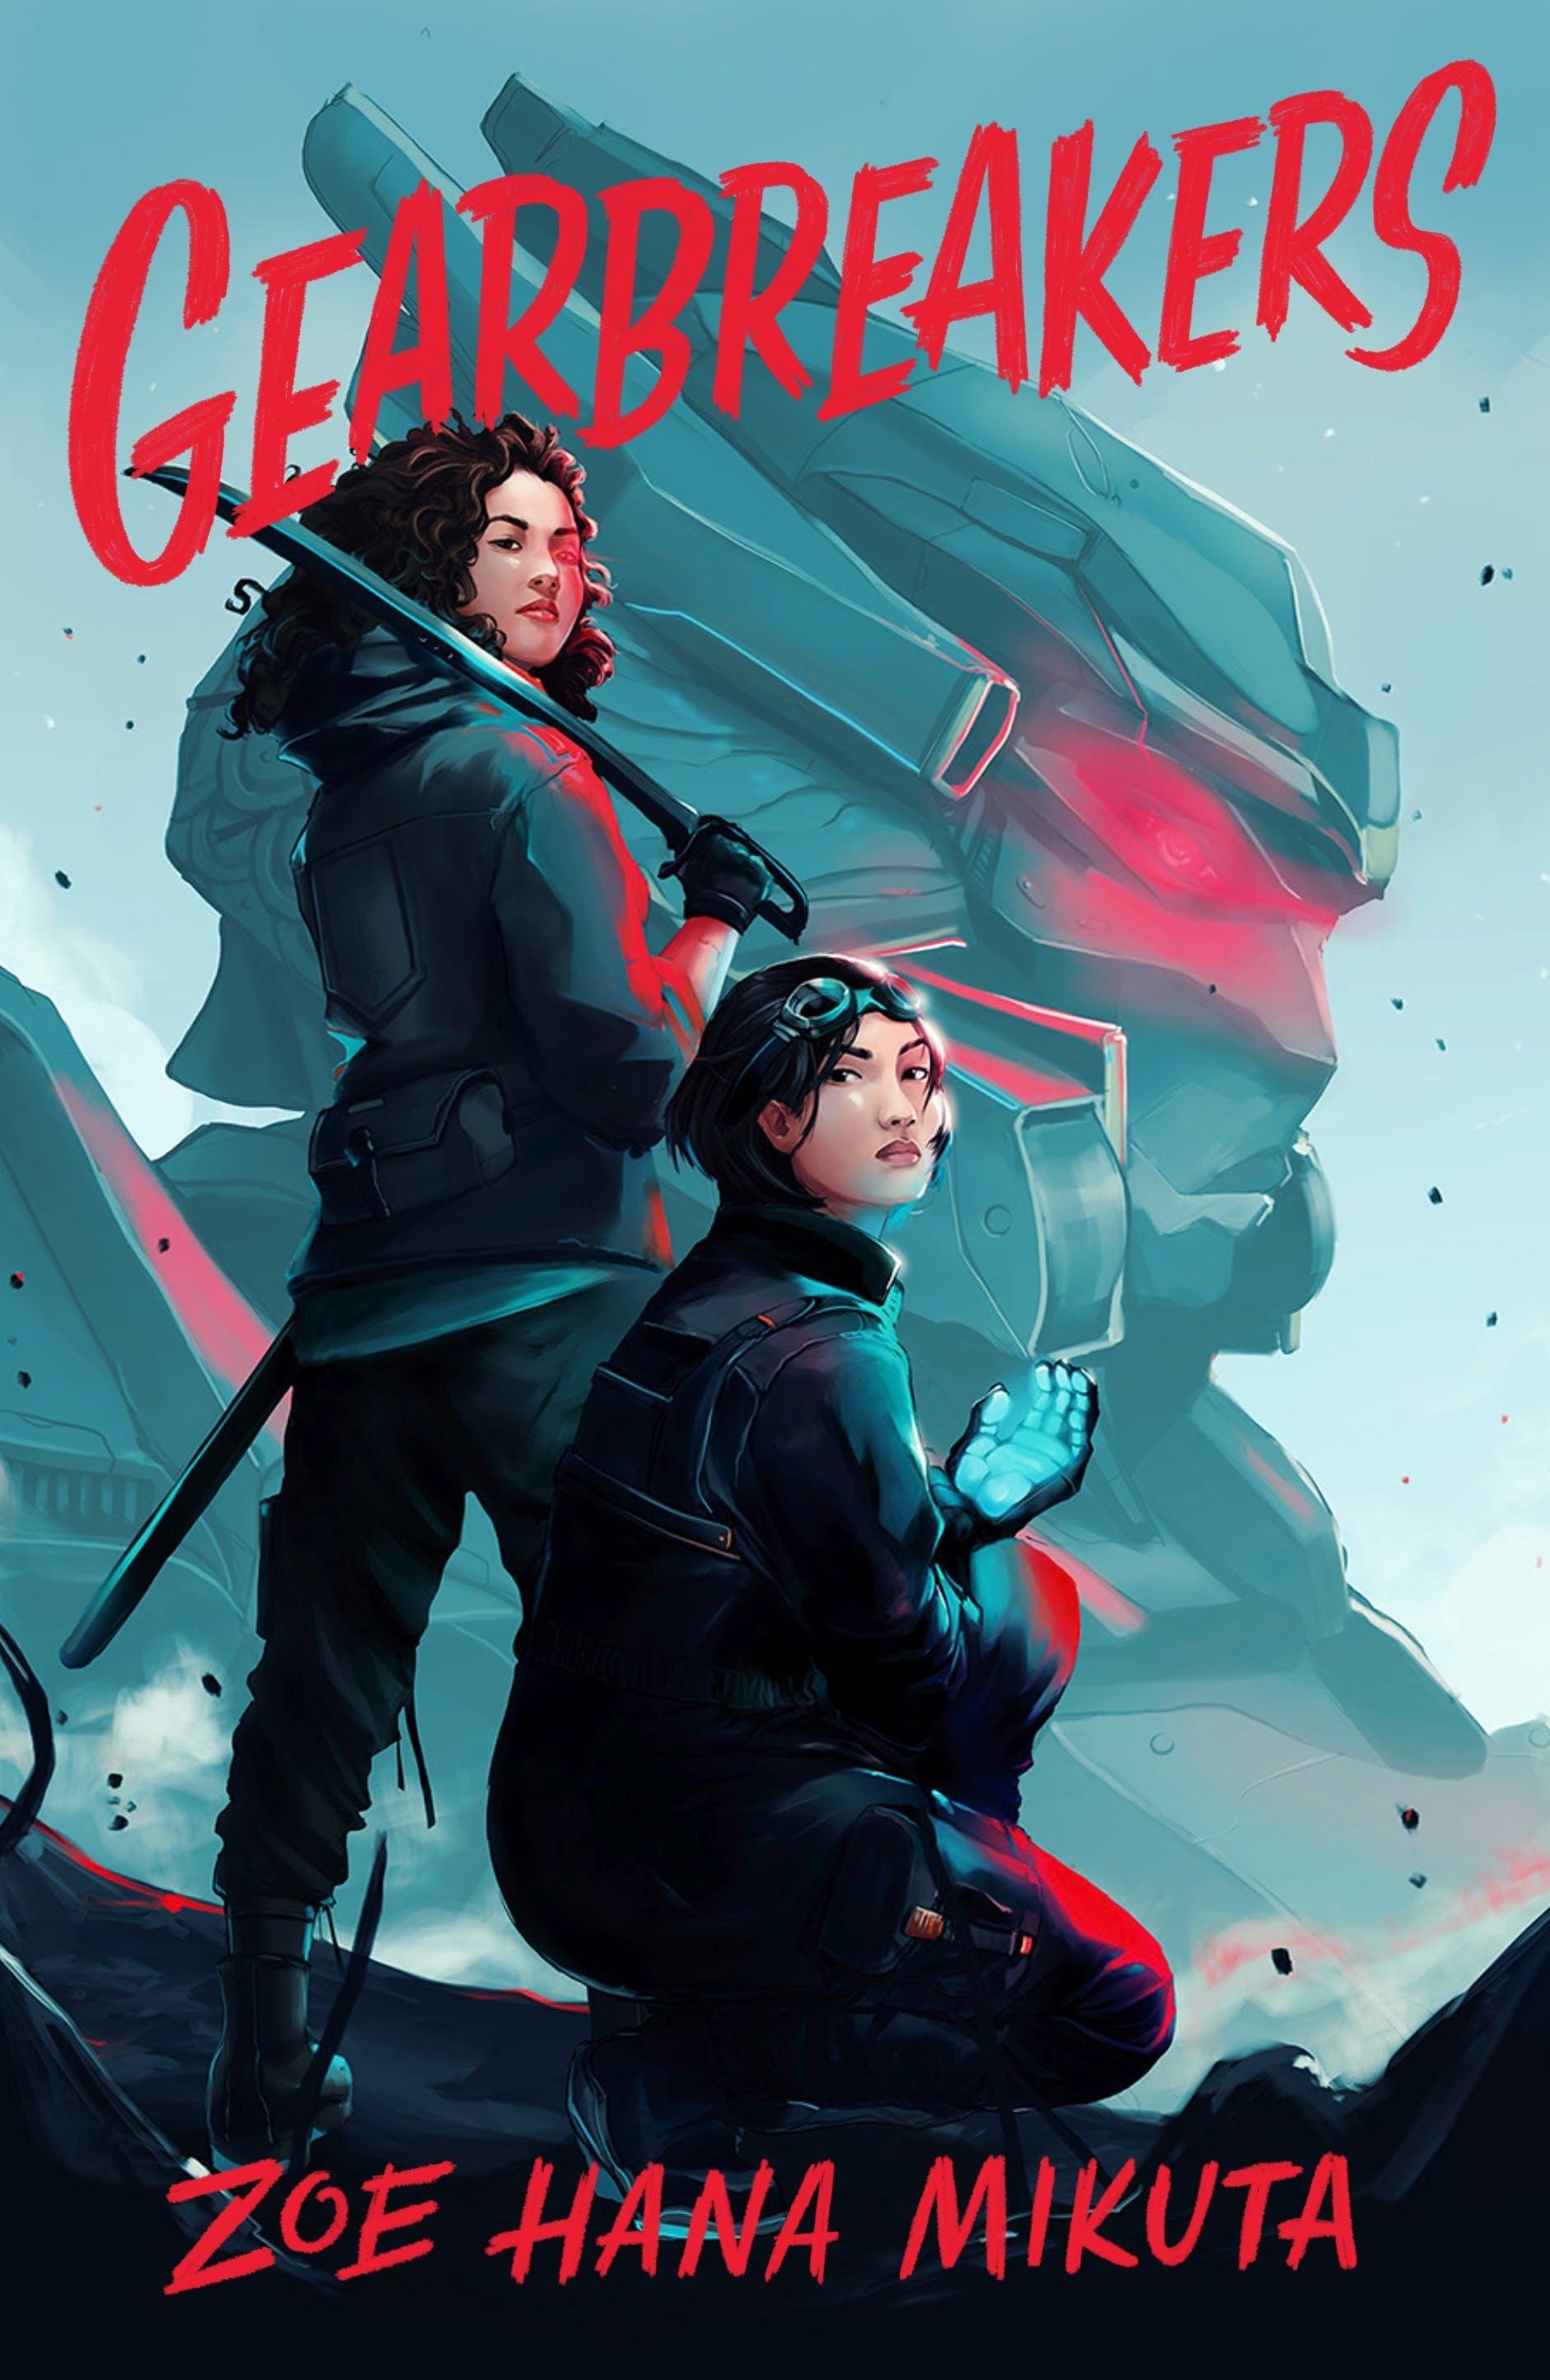 Image of Gearbreakers